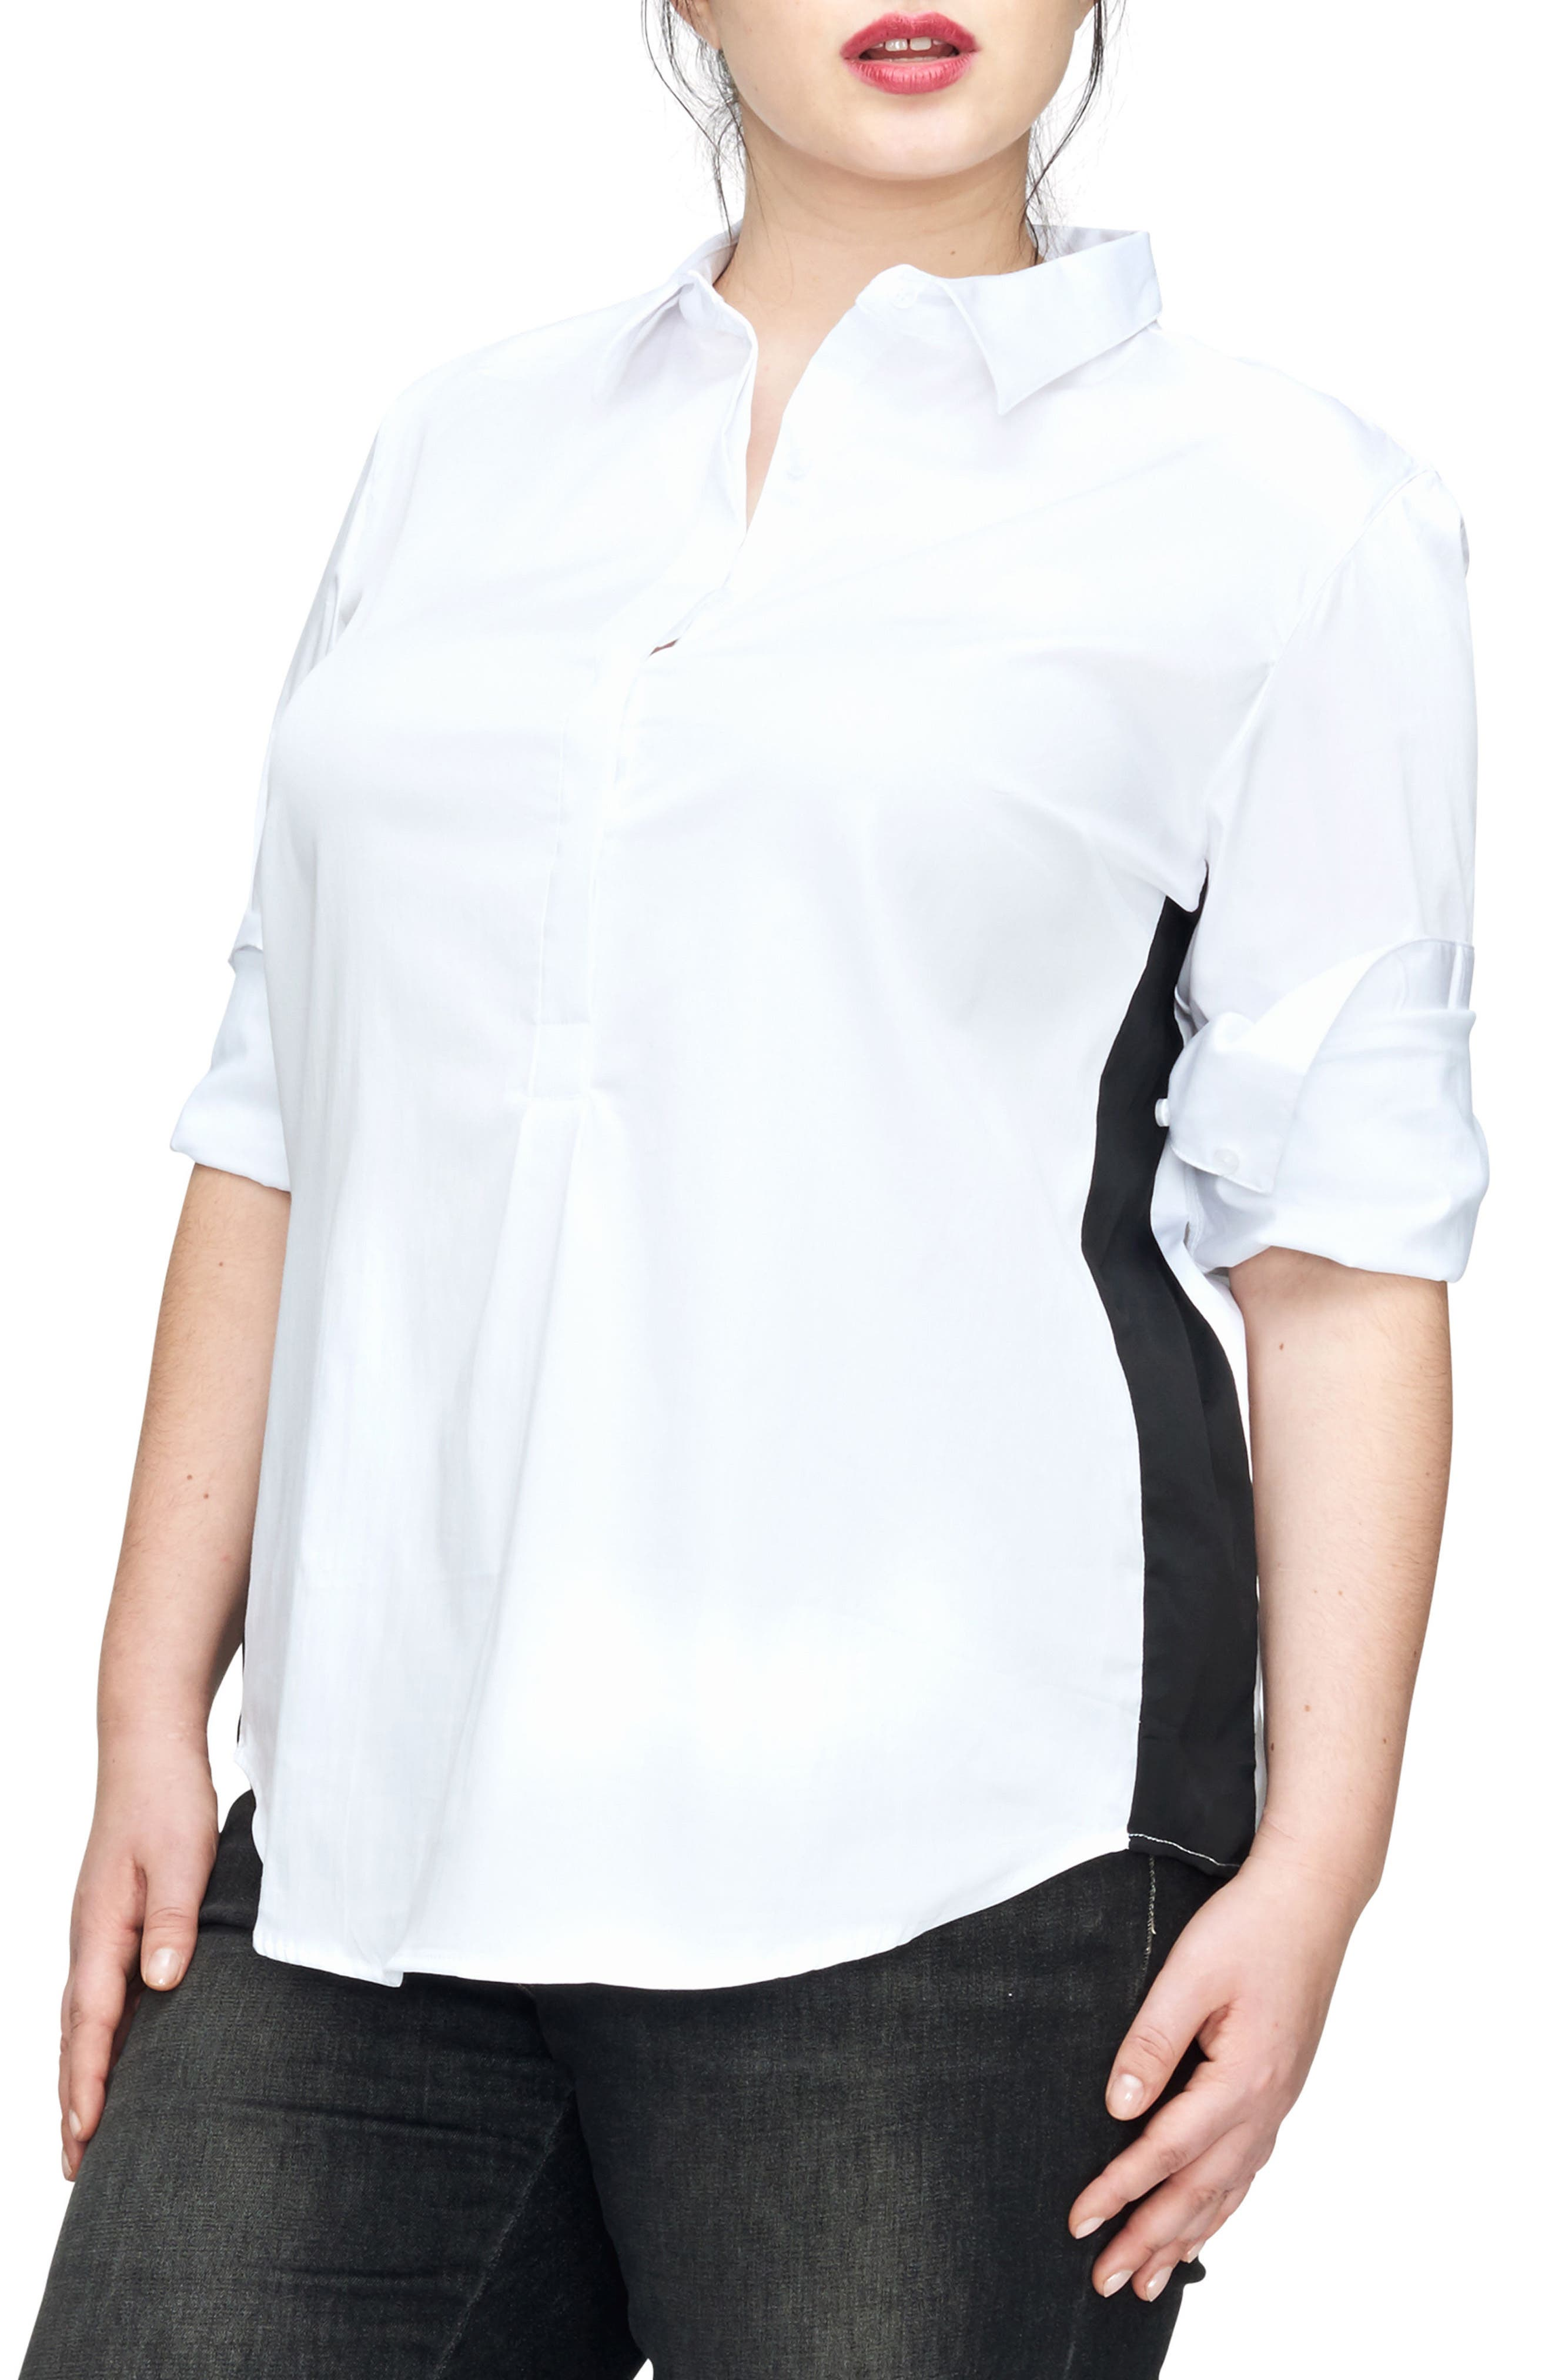 Ebro Colorblock Shirt,                         Main,                         color, White/ Black